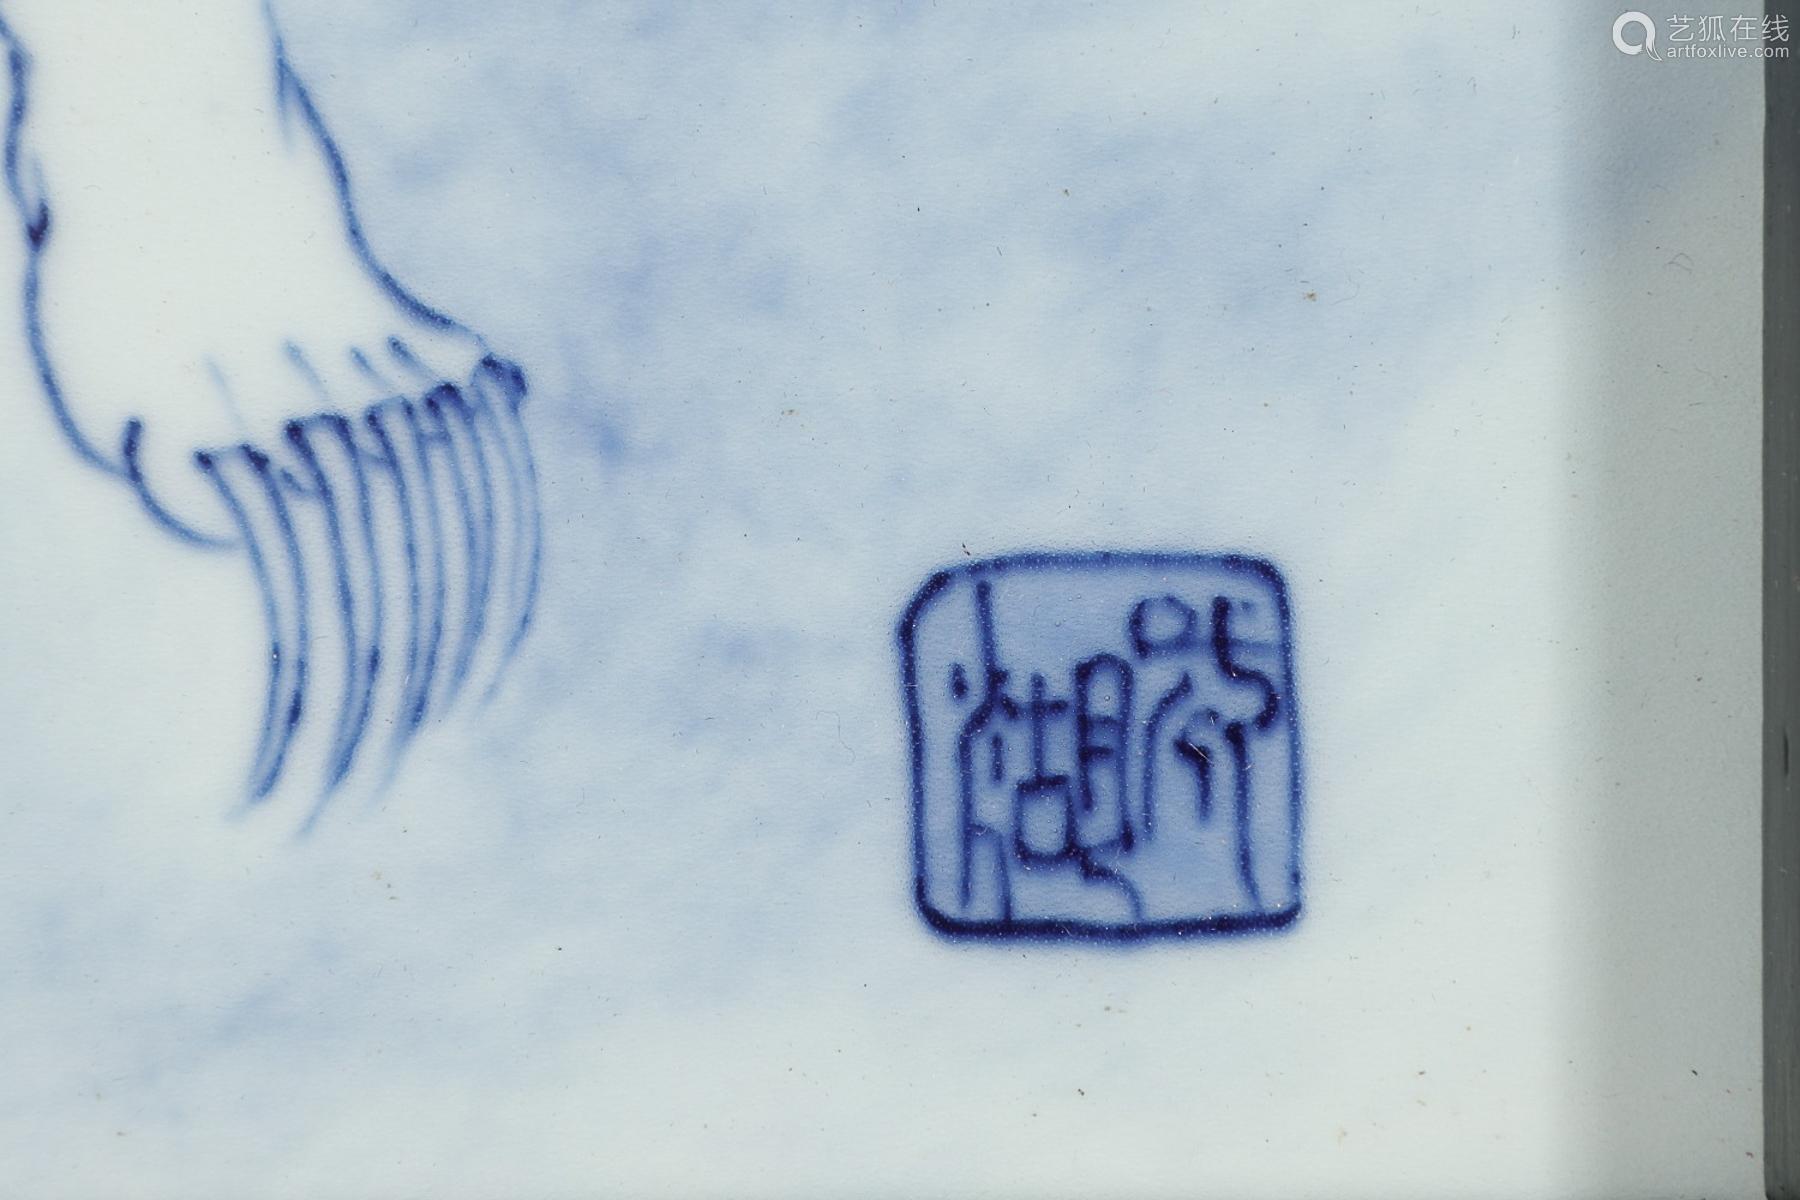 BLUE WHITE PORCELAIN PLATE BY WANG'BU